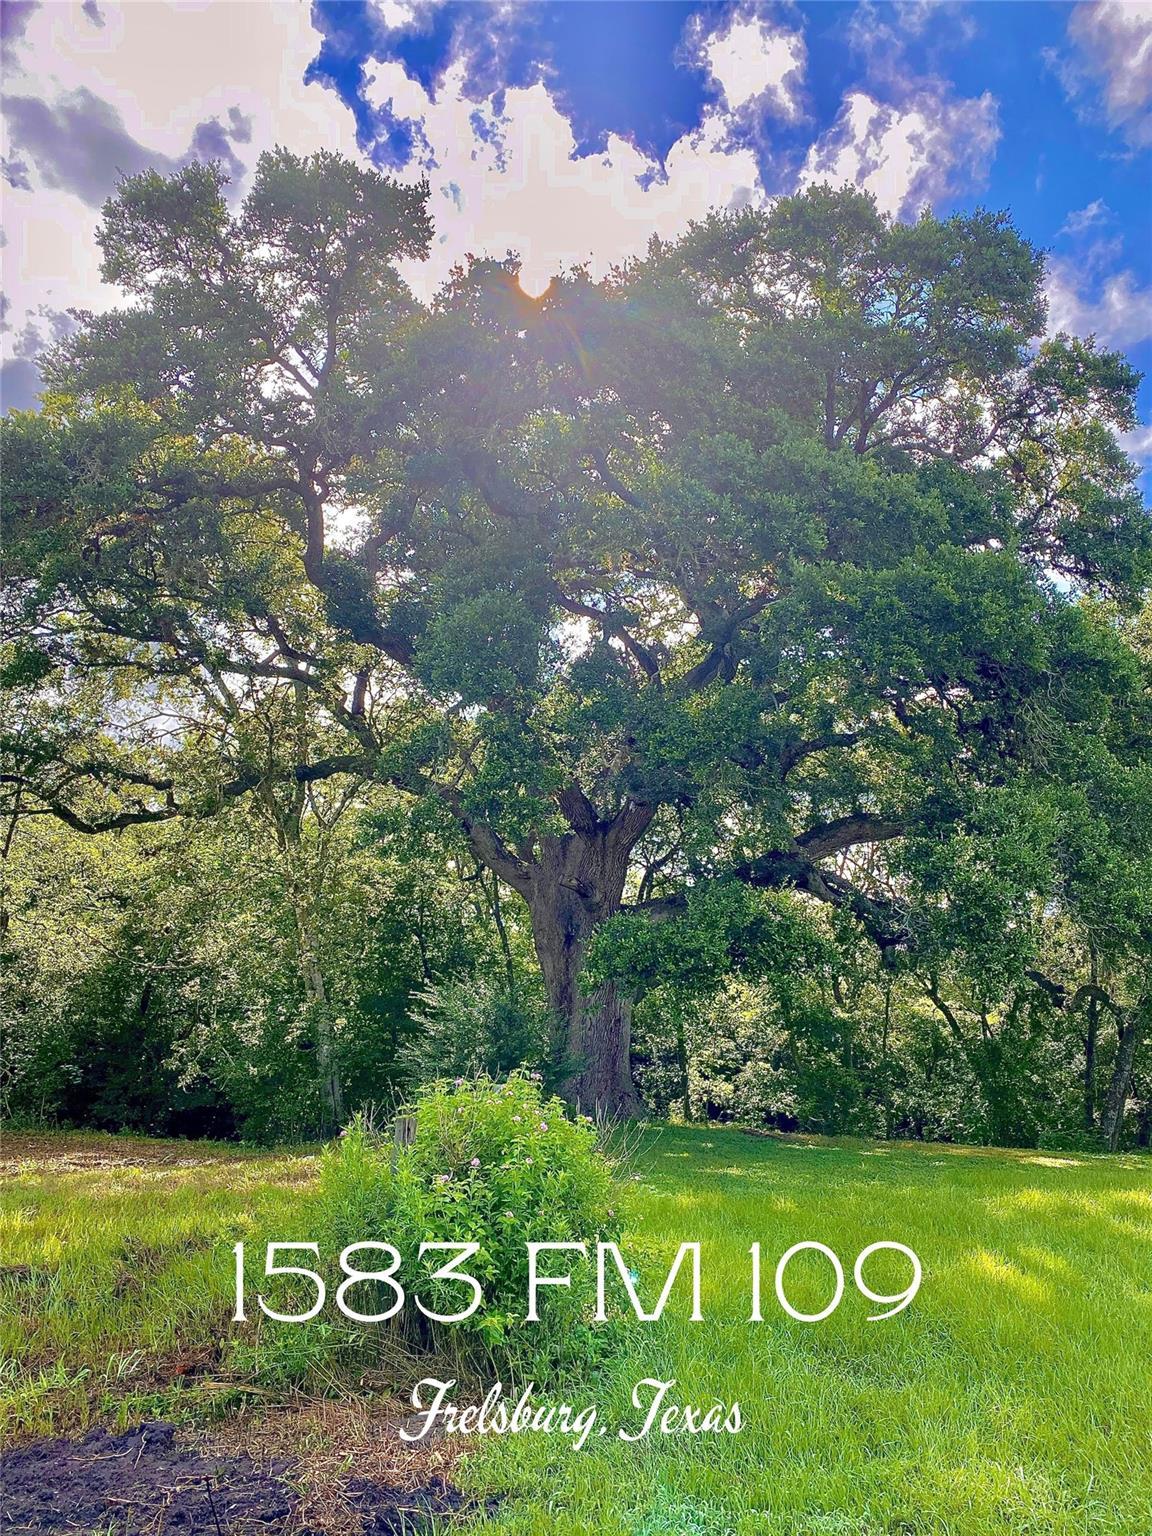 1583 Fm 109 Property Photo 1